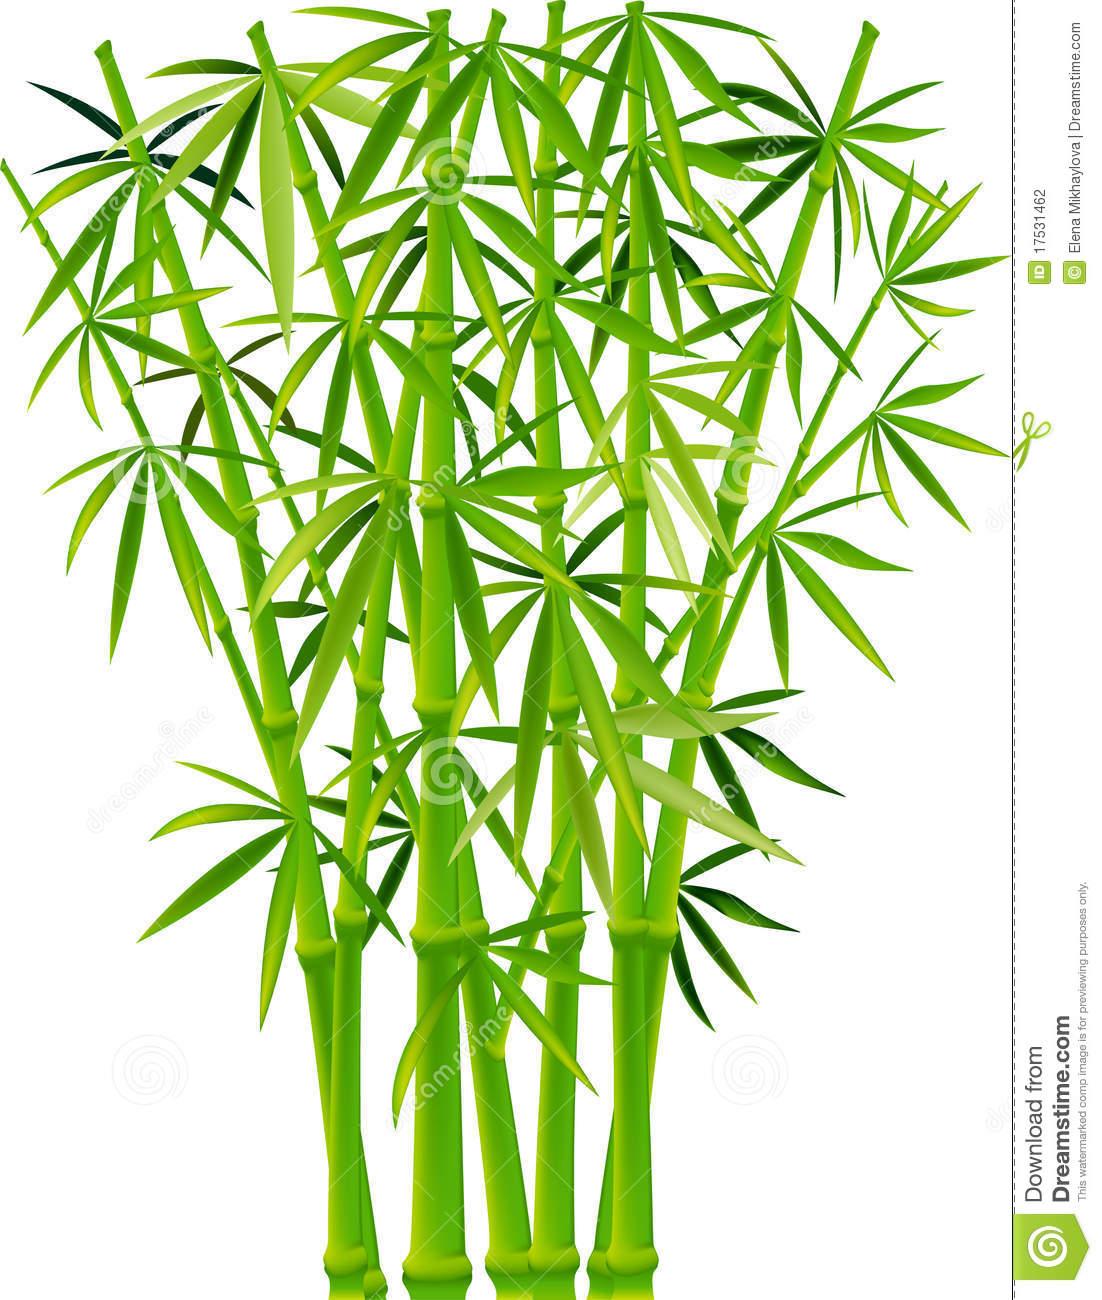 Bamboo clipart. Panda free images bambooclipart